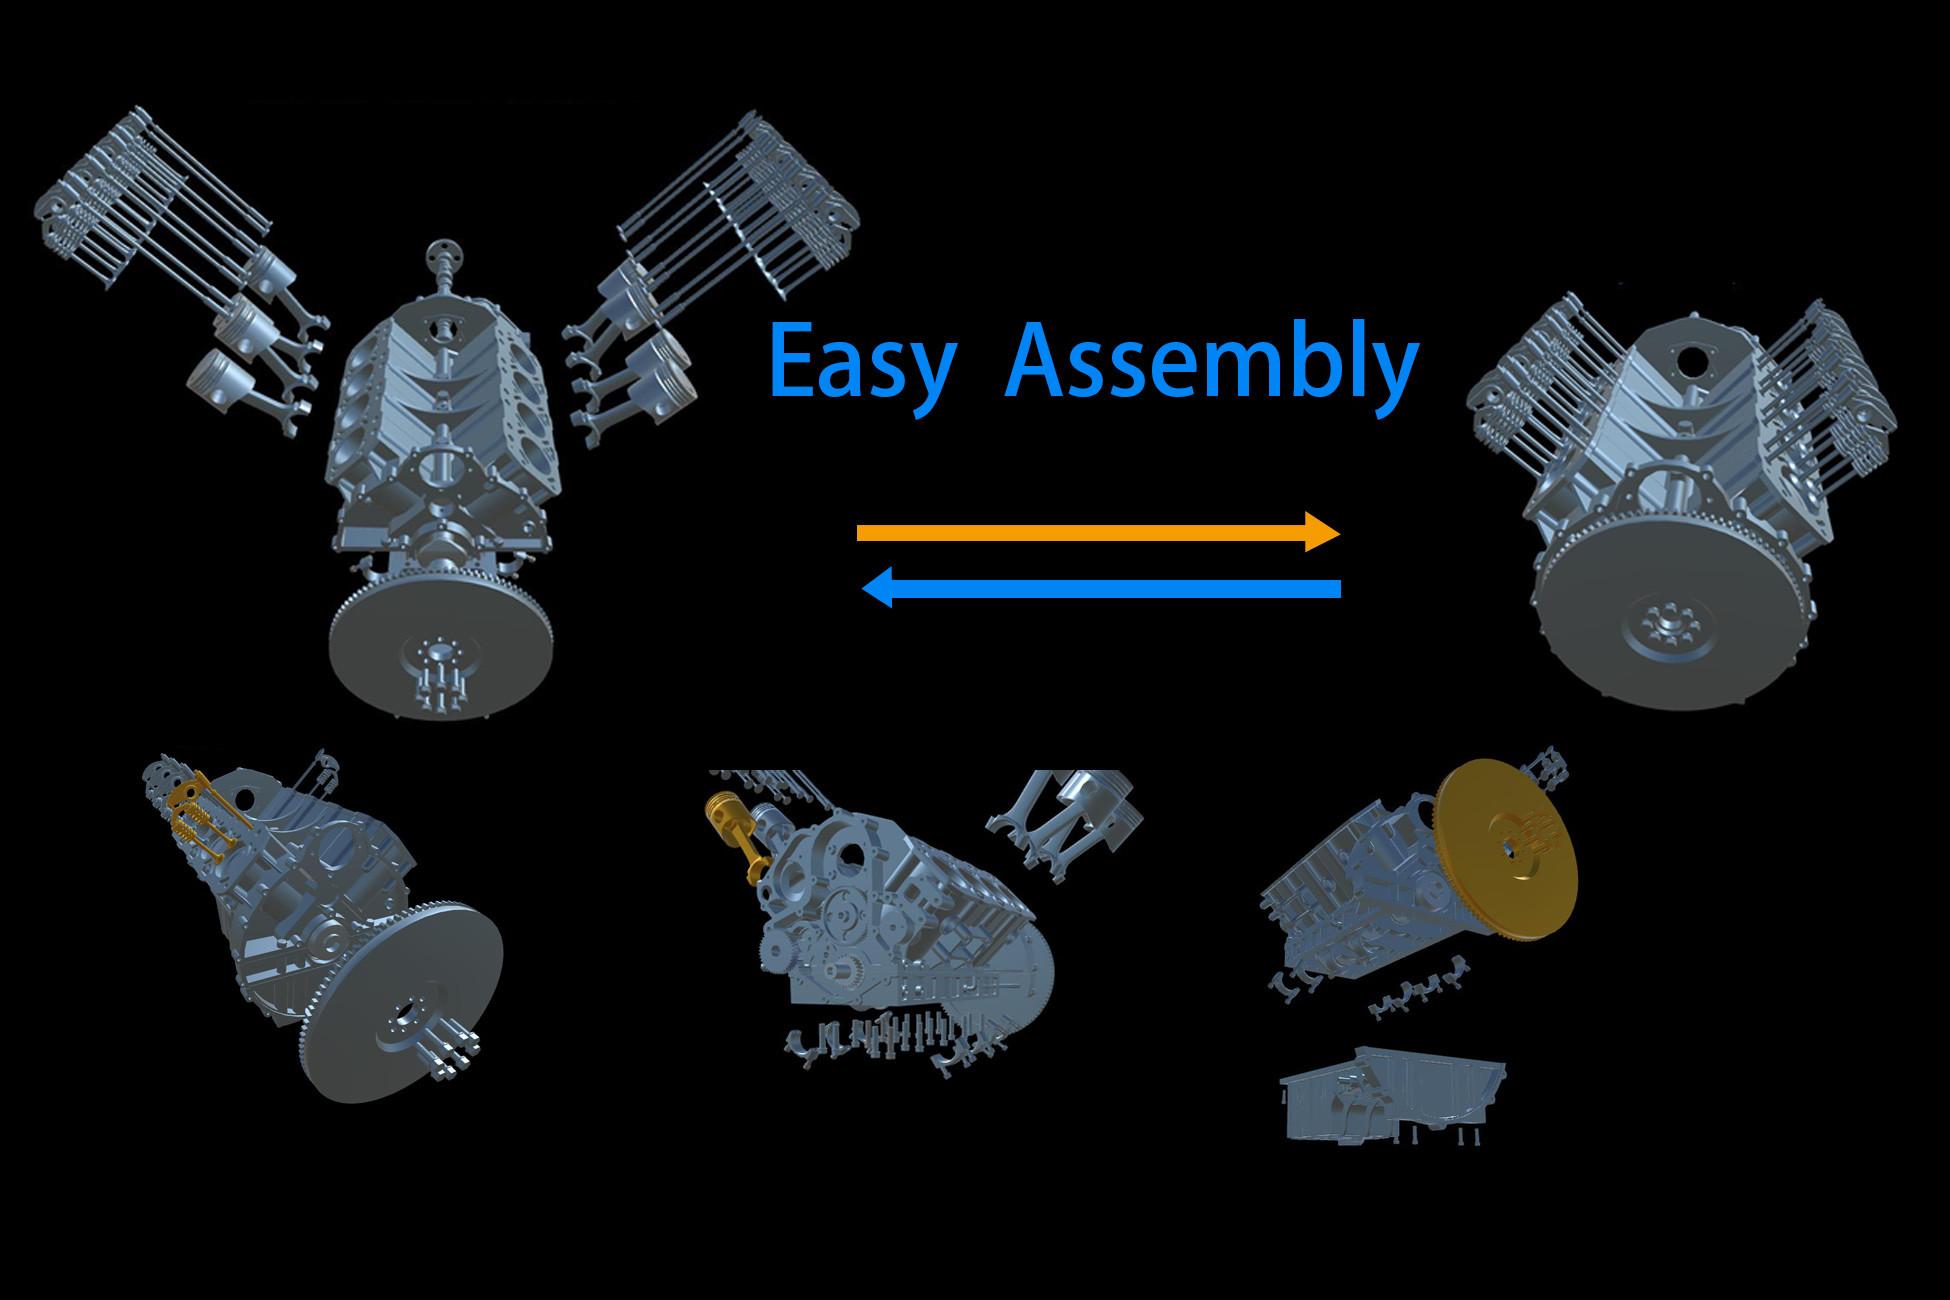 EasyAssembly